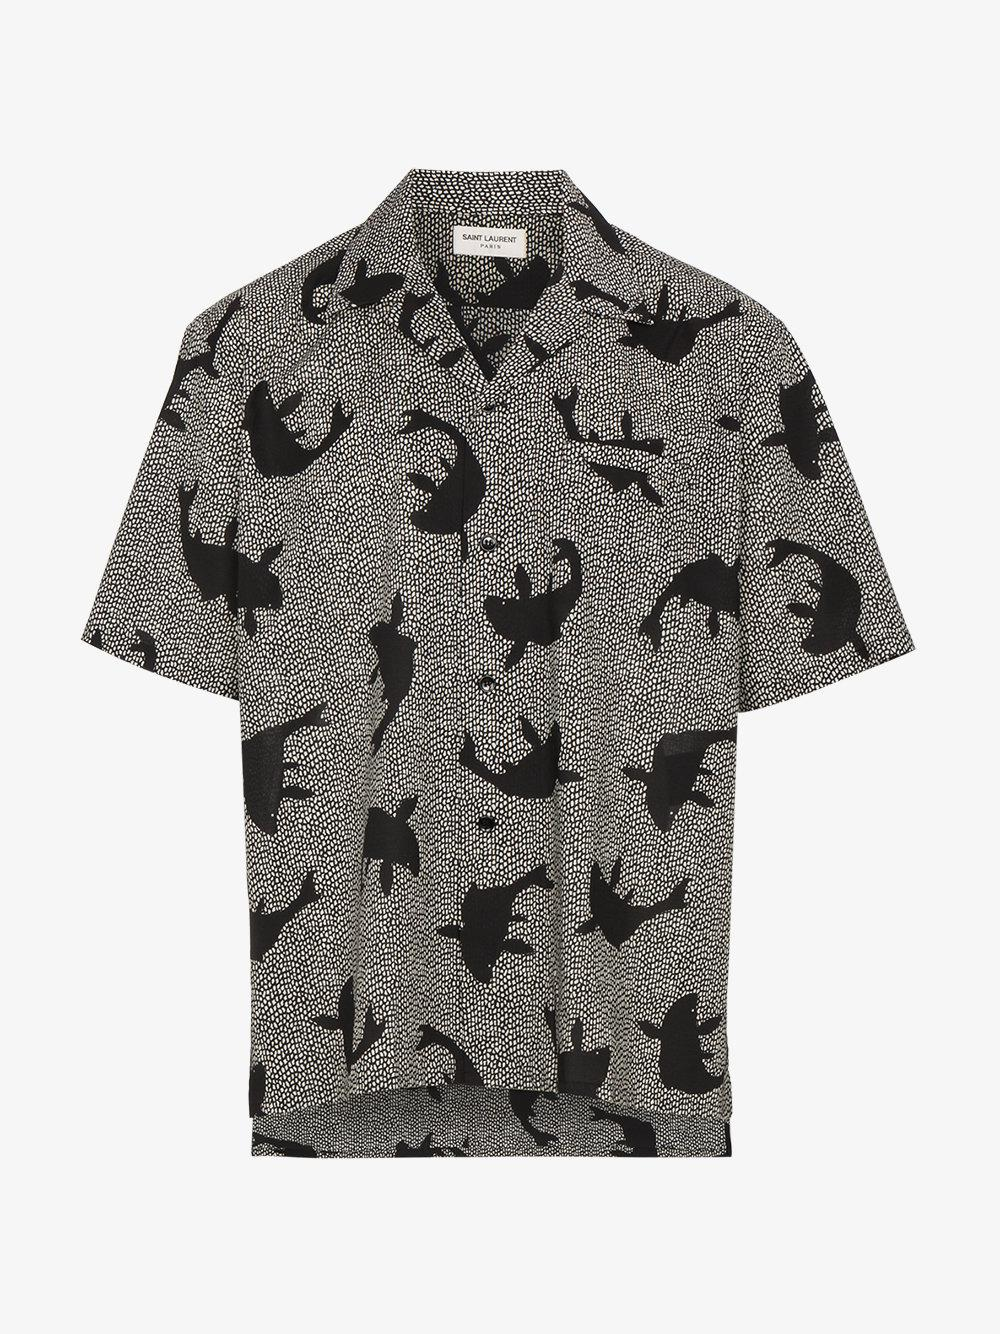 Beautiful Bowling Shirt Sewing Pattern Ensign - Easy Scarf Knitting ...